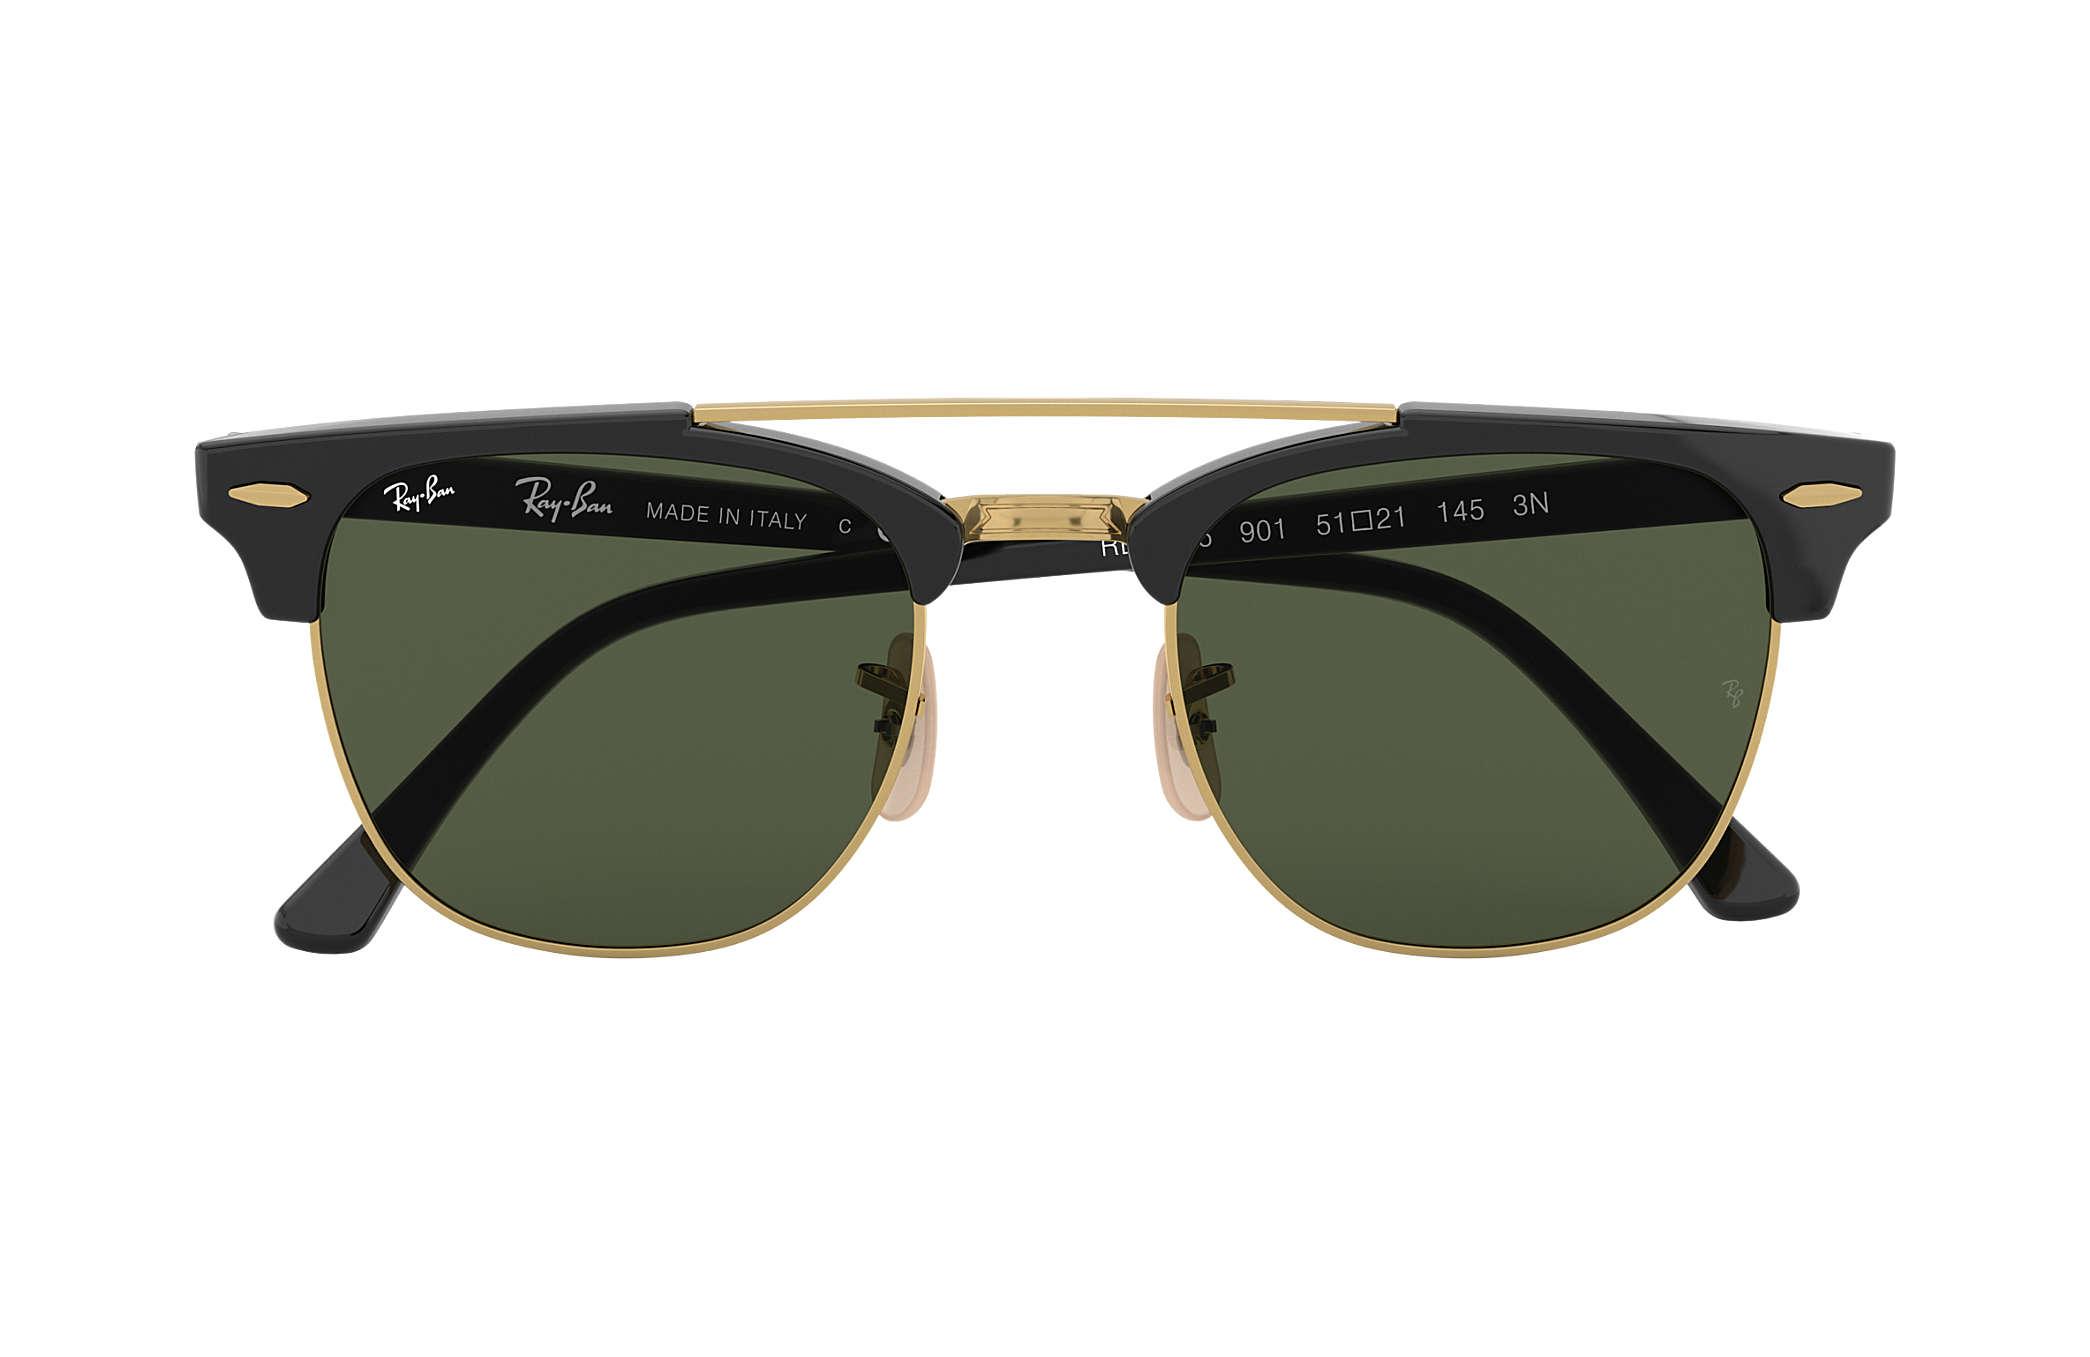 e83ce0f273e Ray-Ban Clubmaster Double Bridge RB3816 Black - Nylon - Green Lenses ...